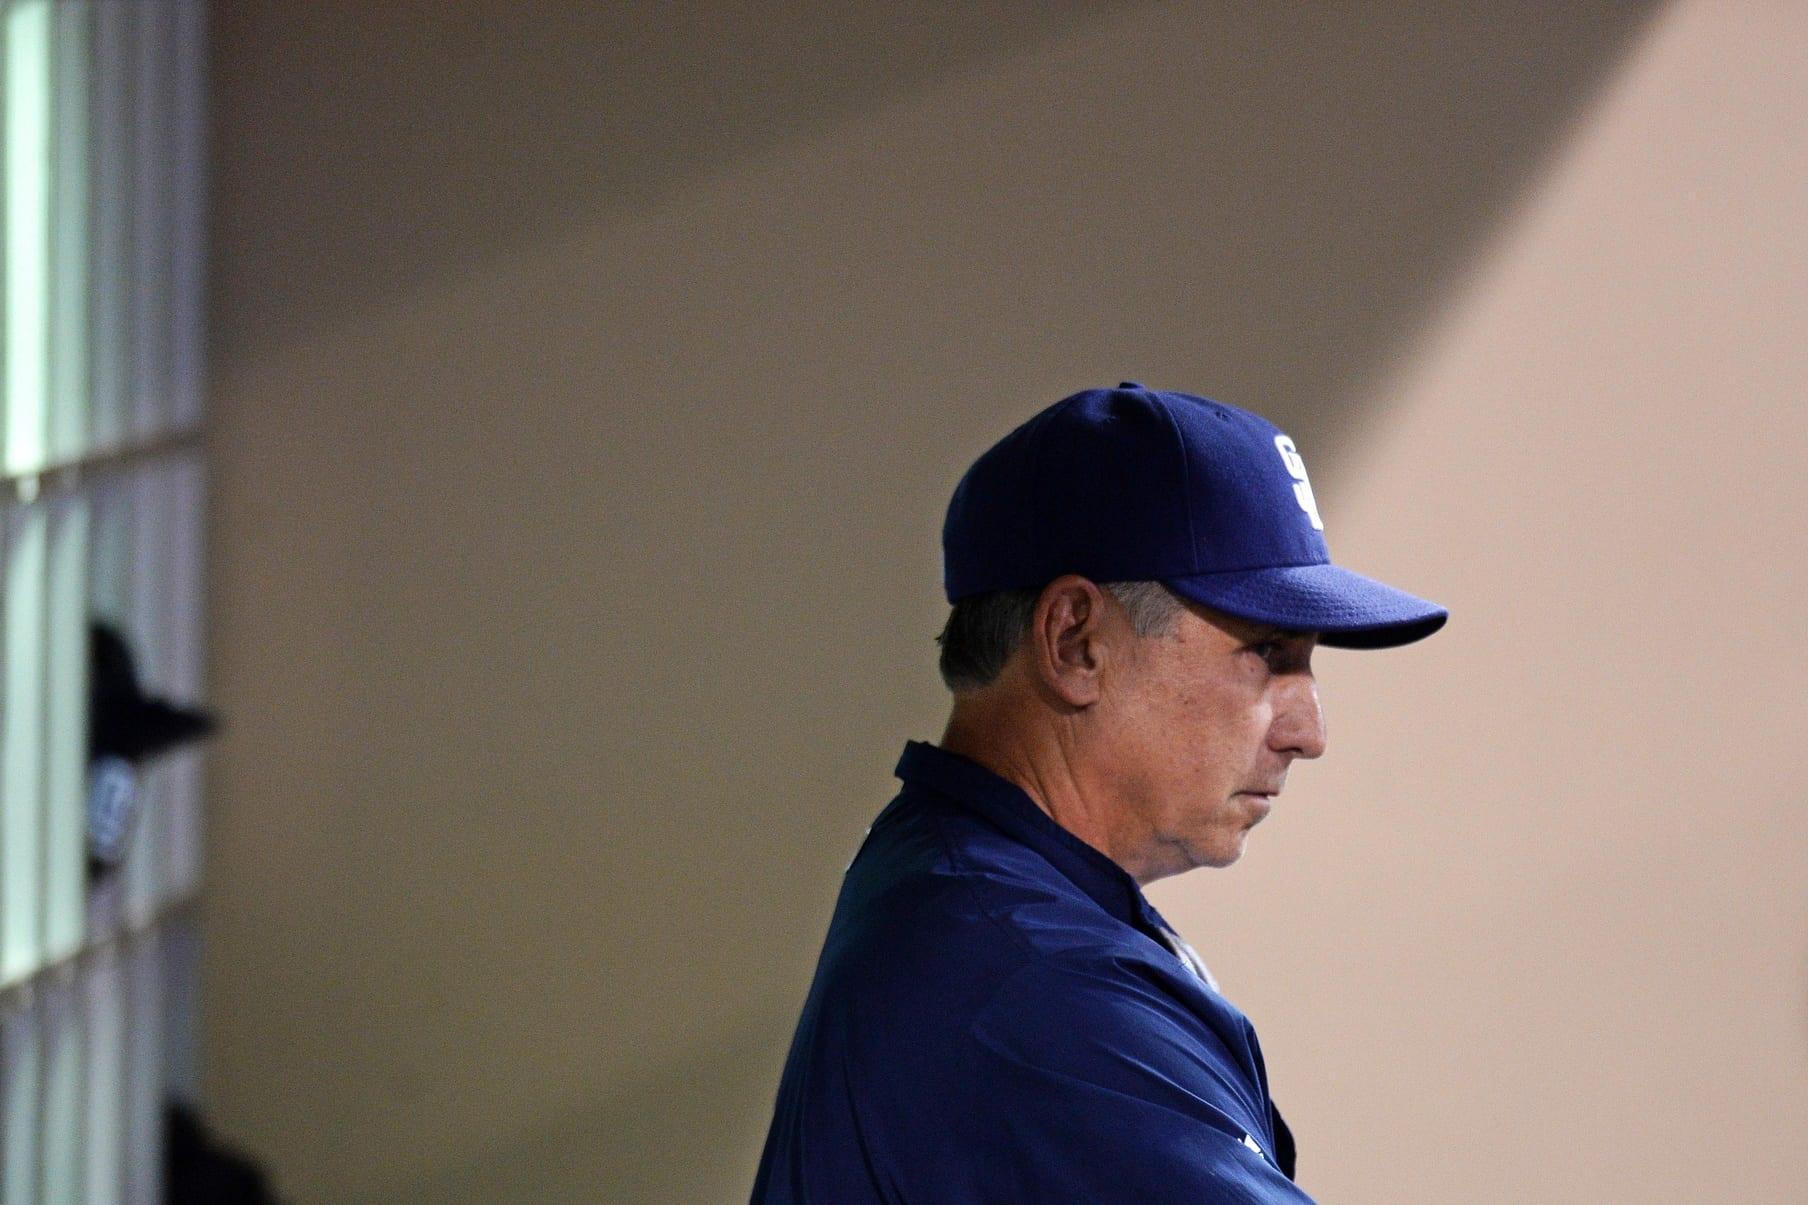 Dodgers Managerial Candidate Profile: Bud Black, The Established Veteran